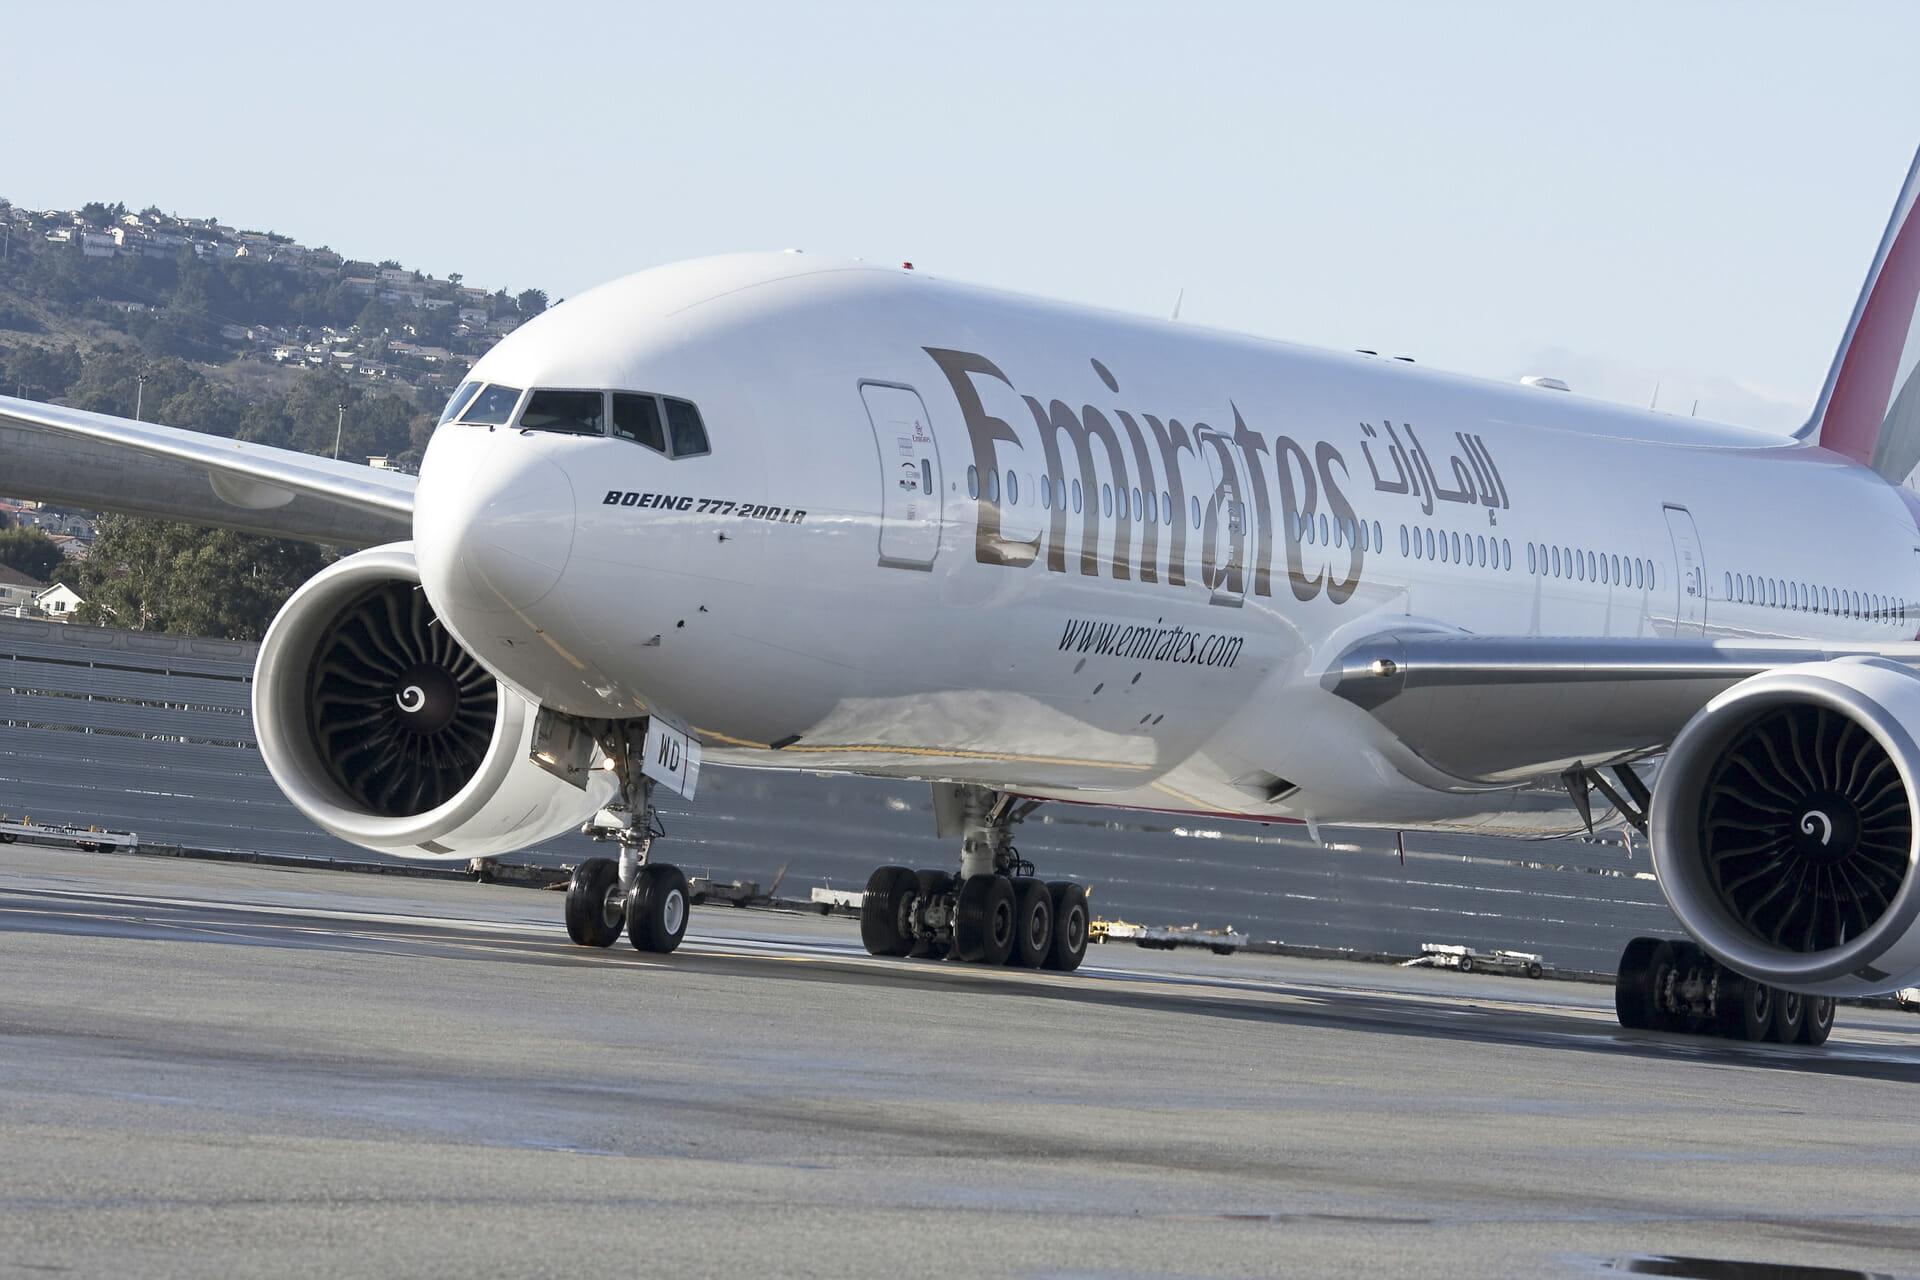 Emirates Air Inaugural Flight on SFO Tarmac